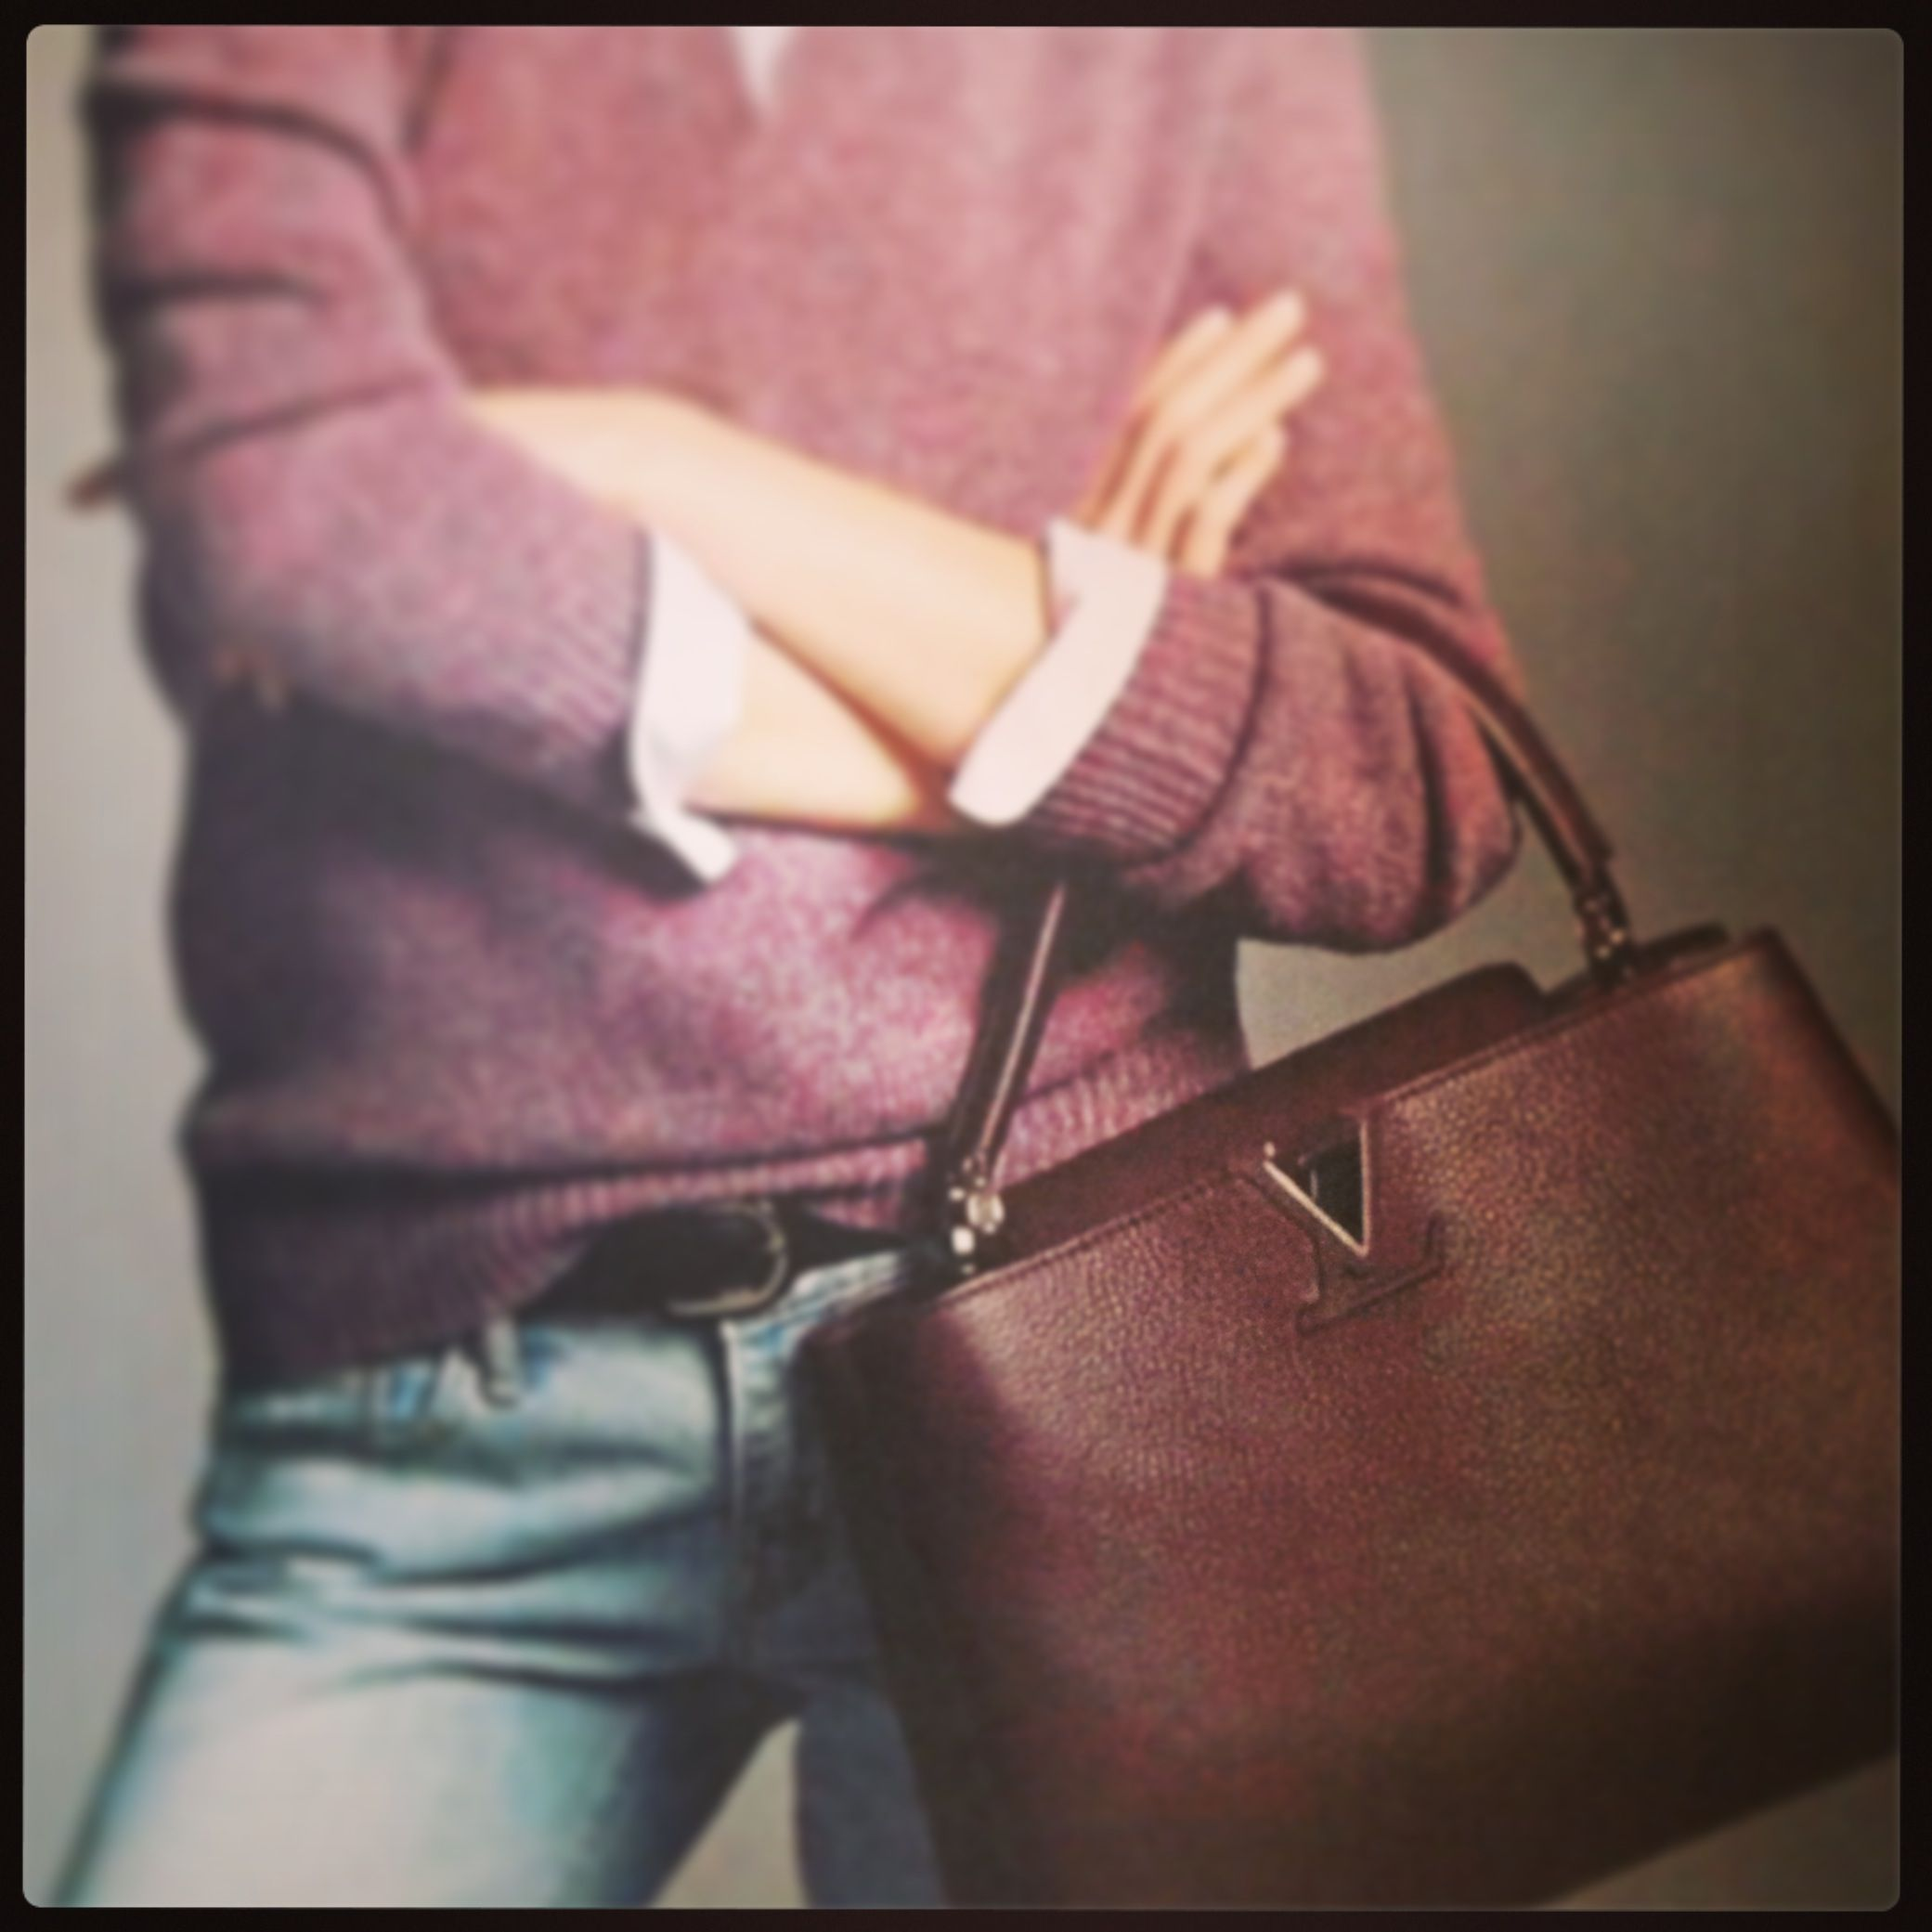 LouisVuitton parnassea bags